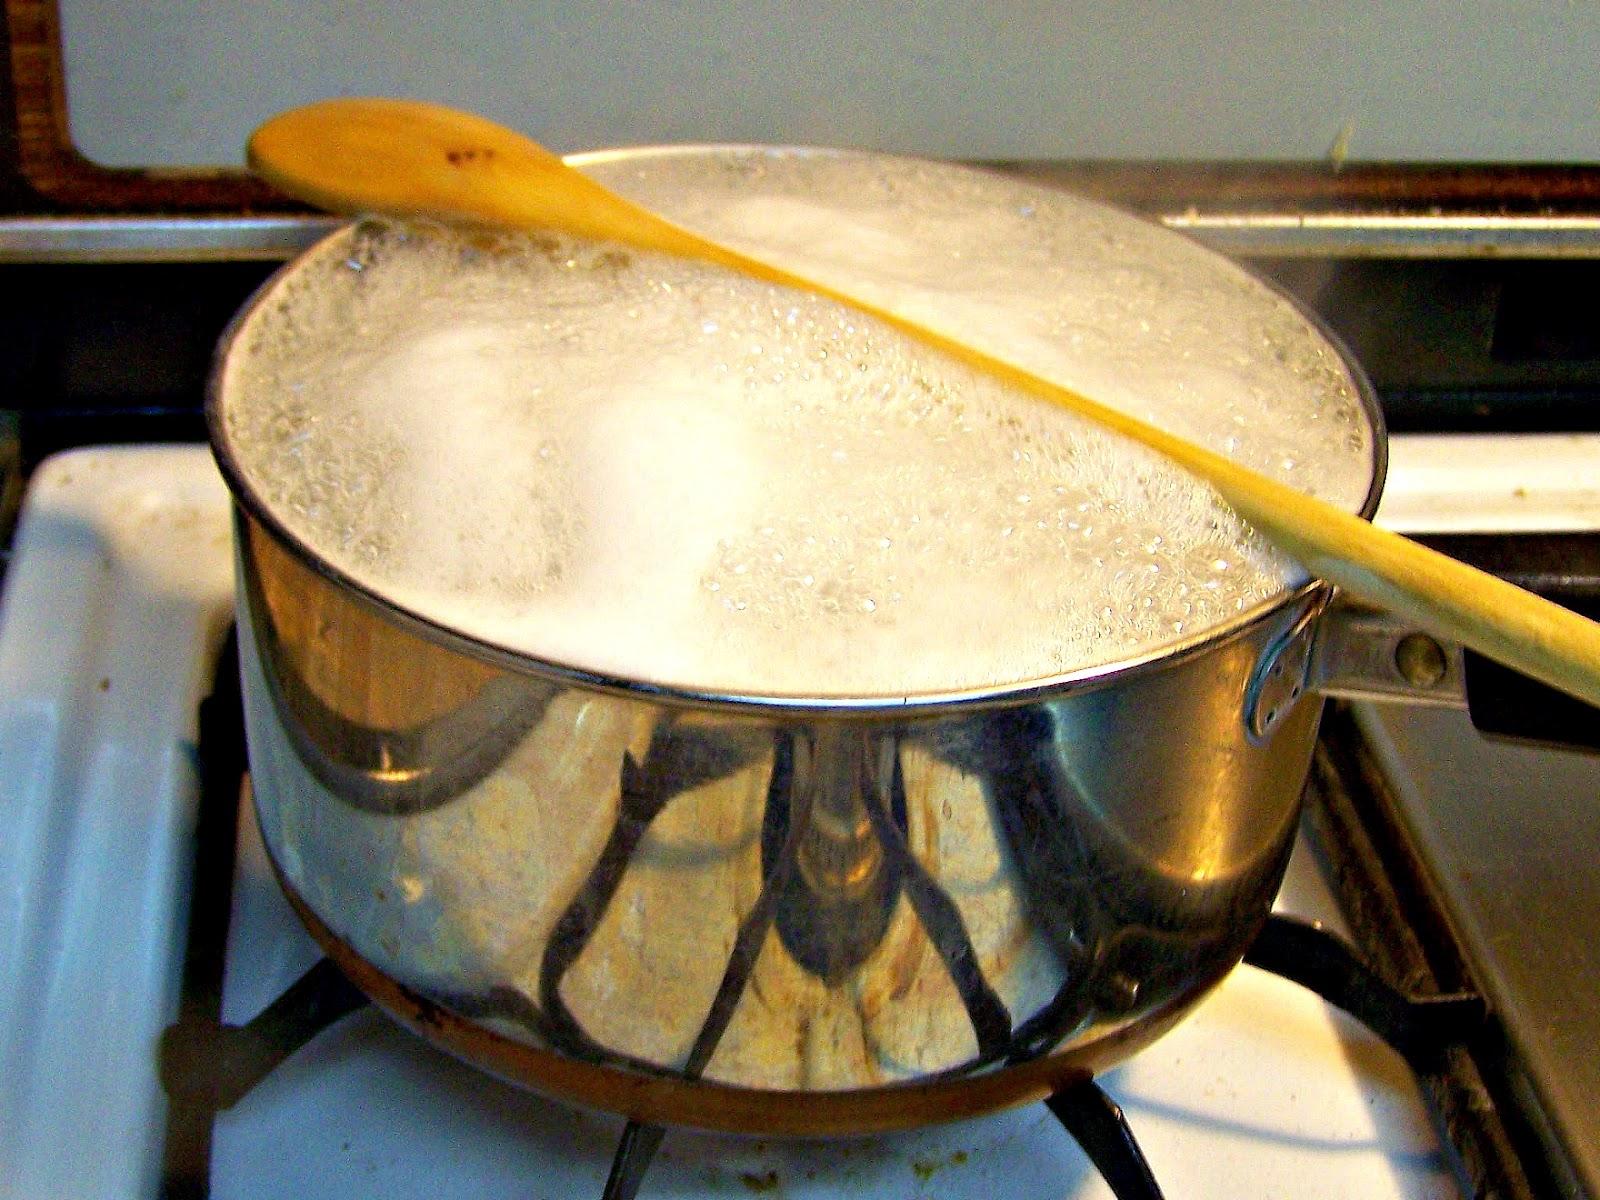 Eat Peel of Mango 3 How to Peel a Mango With